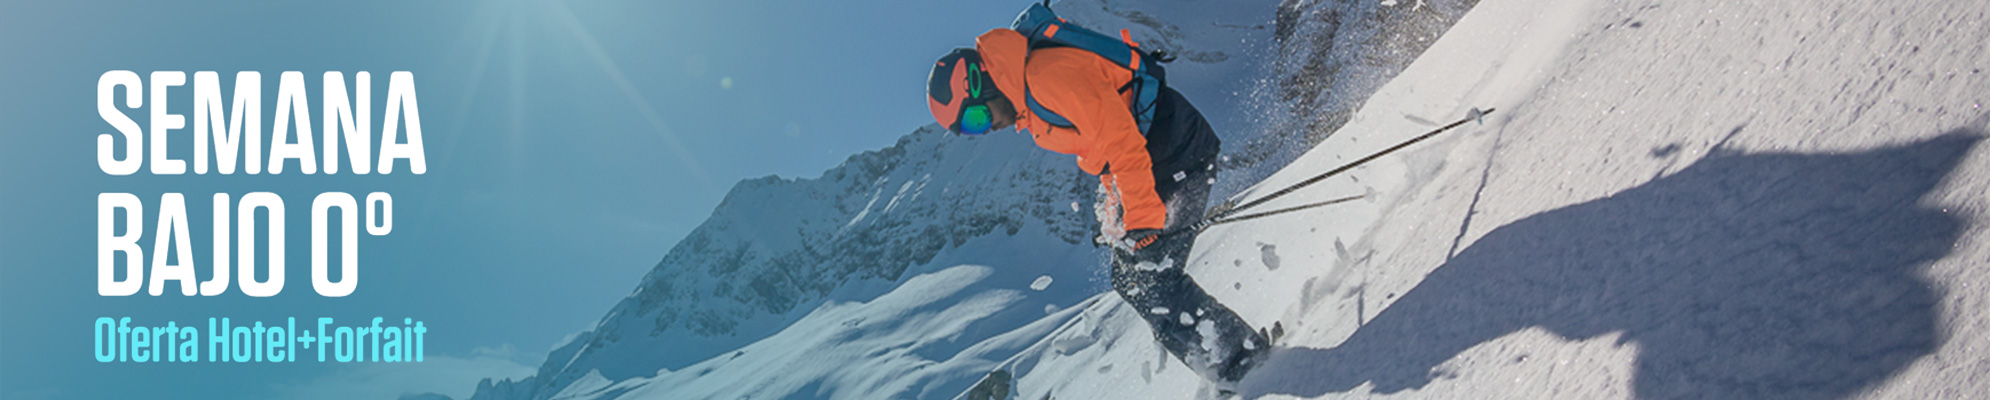 oferta esqui semana bajo cero aramon formigal panticosa cerler